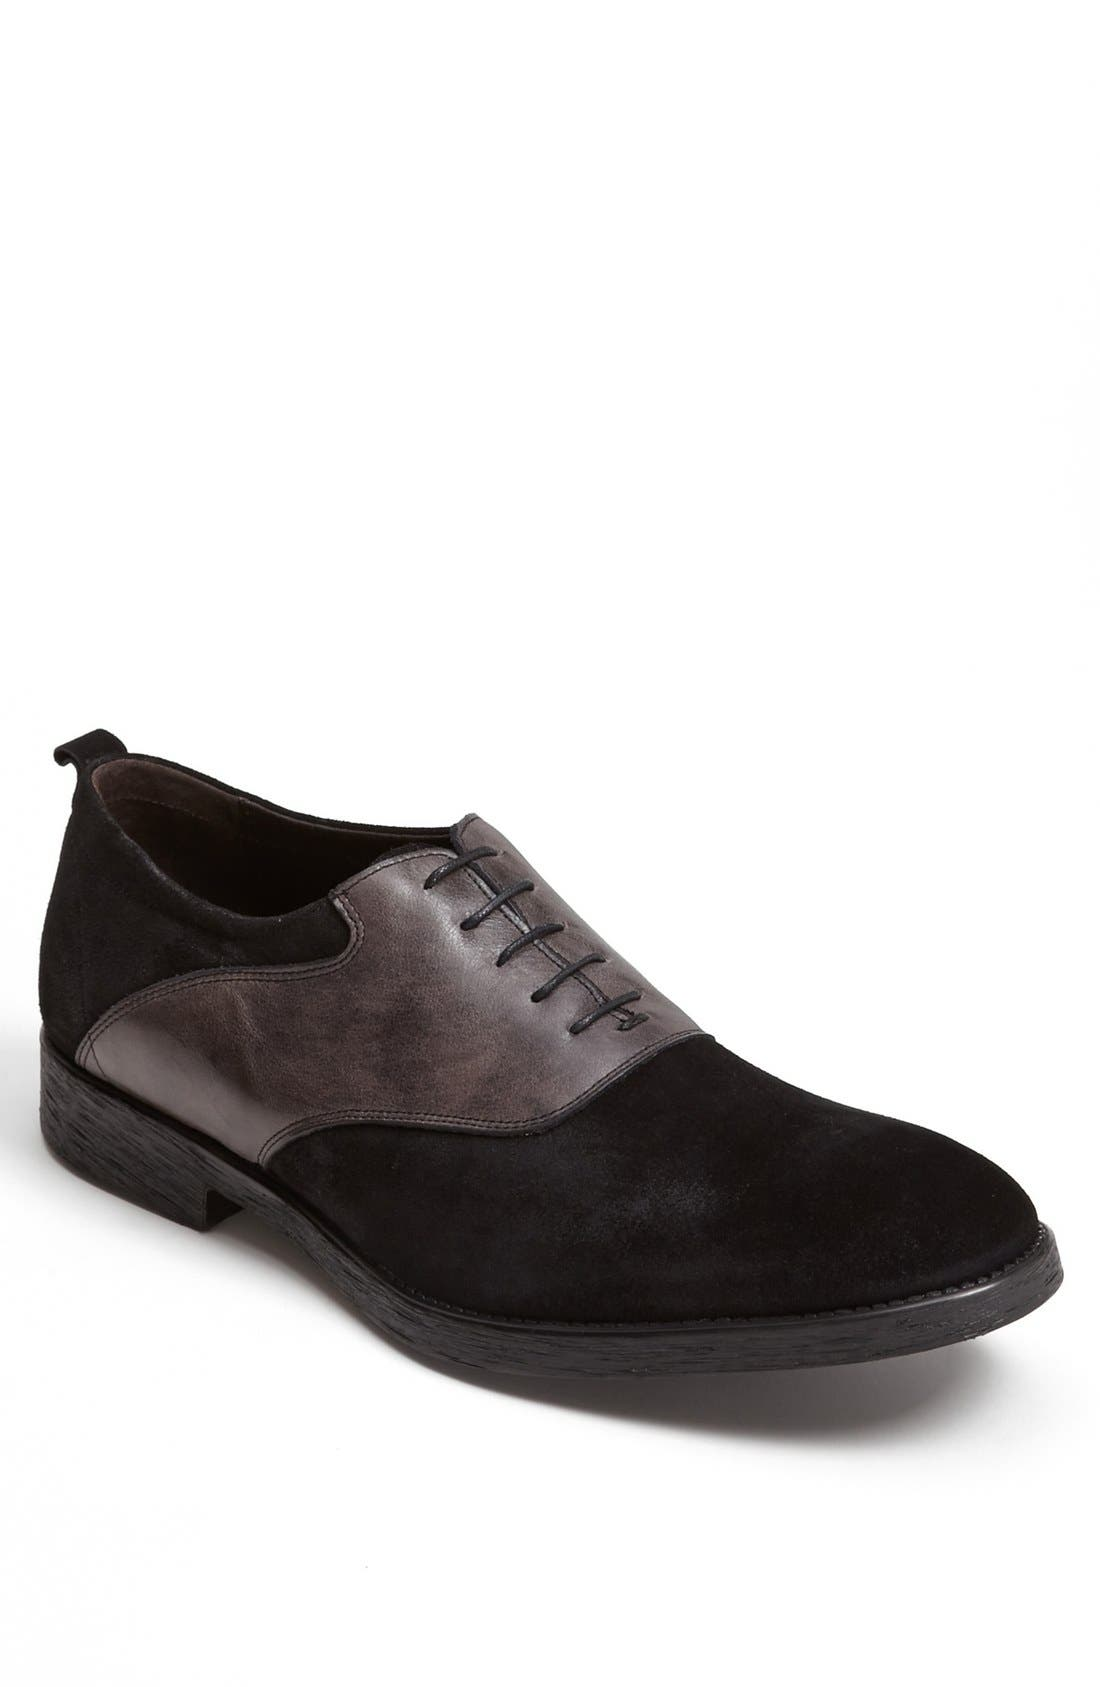 Alternate Image 1 Selected - Wallin & Bros. 'Jacobs' Saddle Shoe